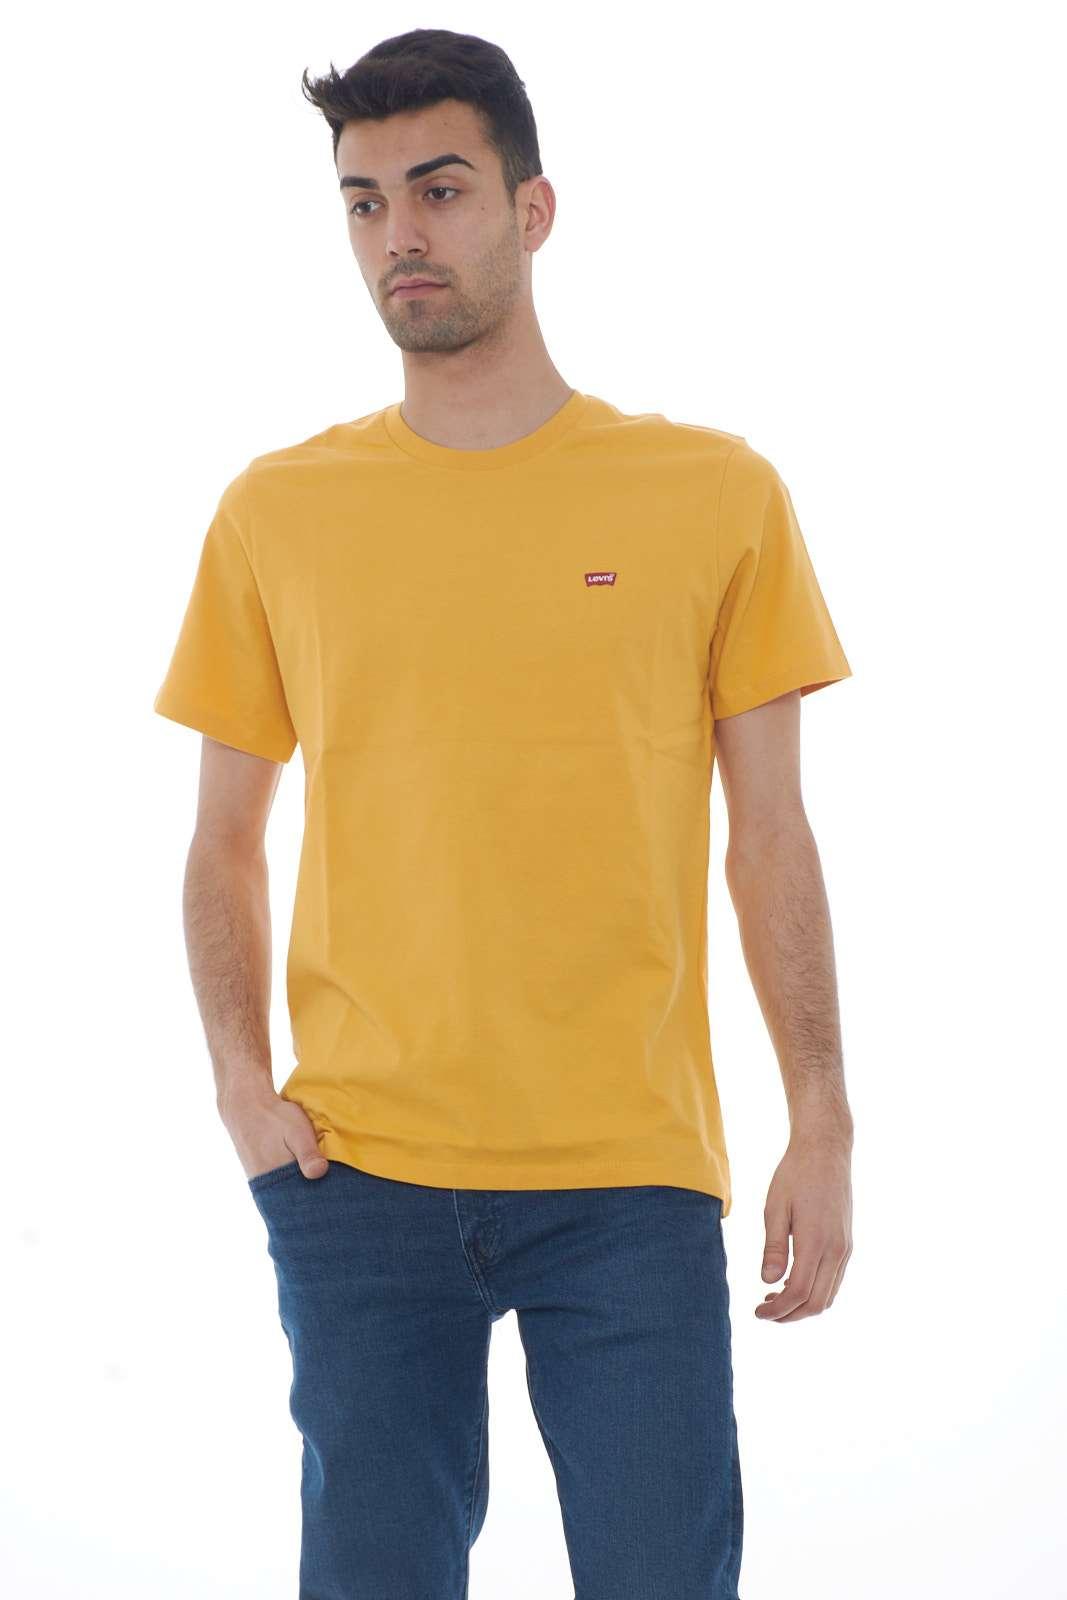 https://www.parmax.com/media/catalog/product/a/i/PE-outlet_parmax-t-shirt-uomo-Levis-171640003-A.jpg